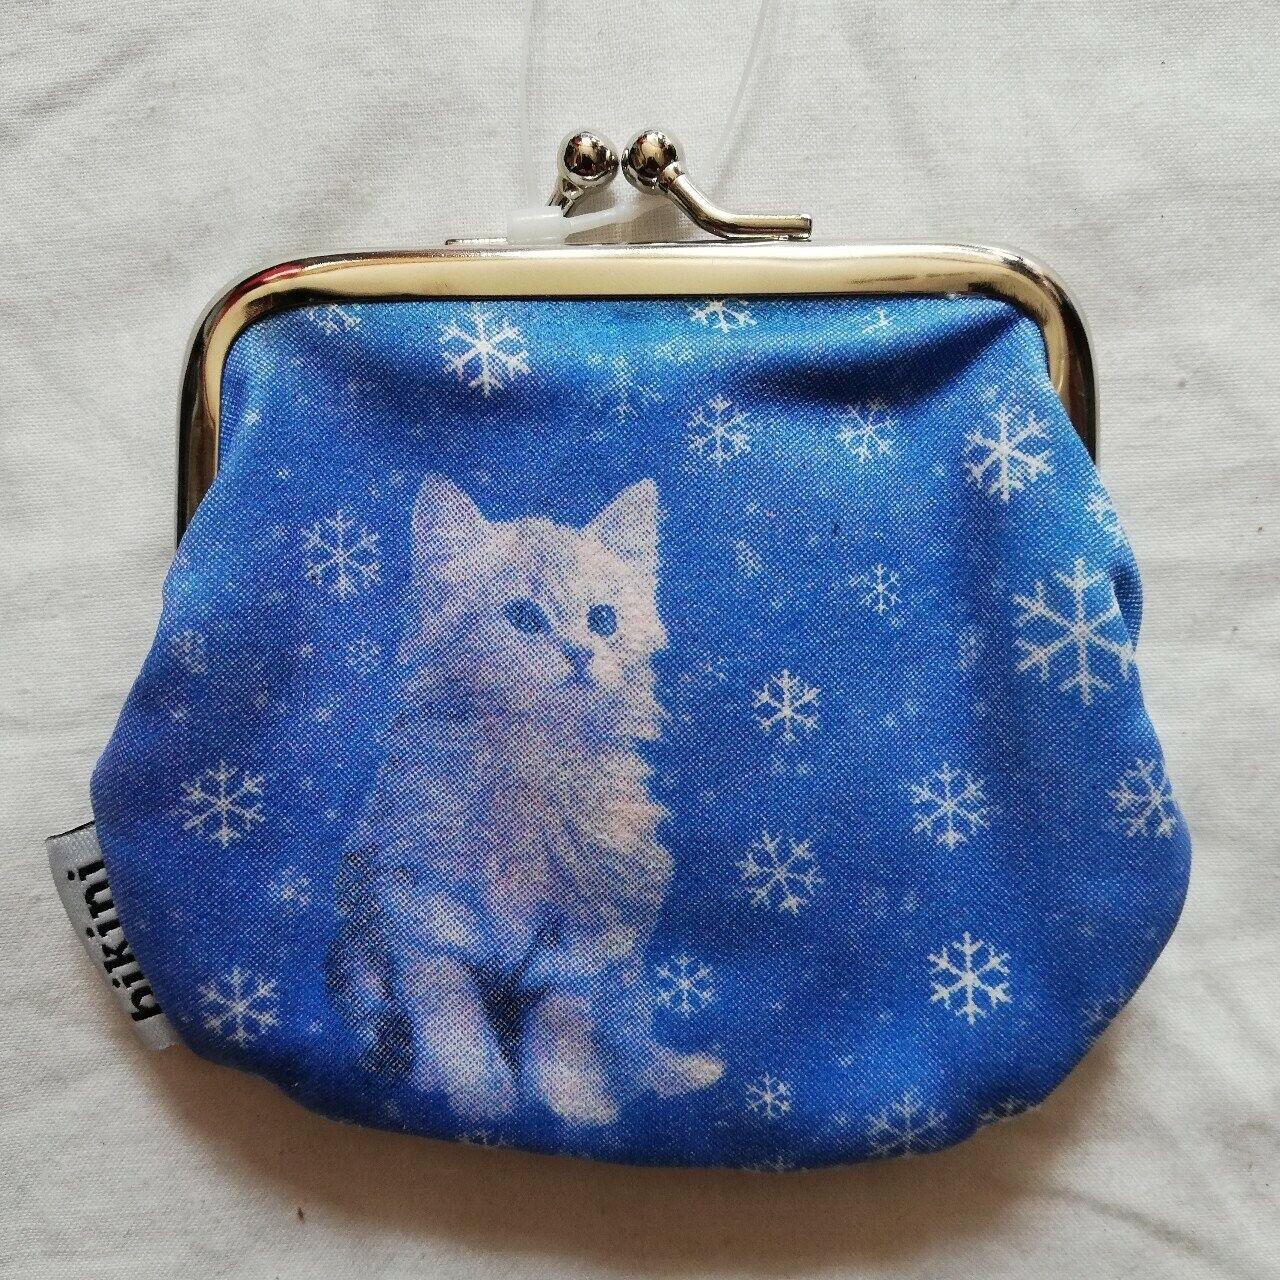 Cute Kitty Cat Kitten clasp fastening coin Purse by Bikini Skinny Dip